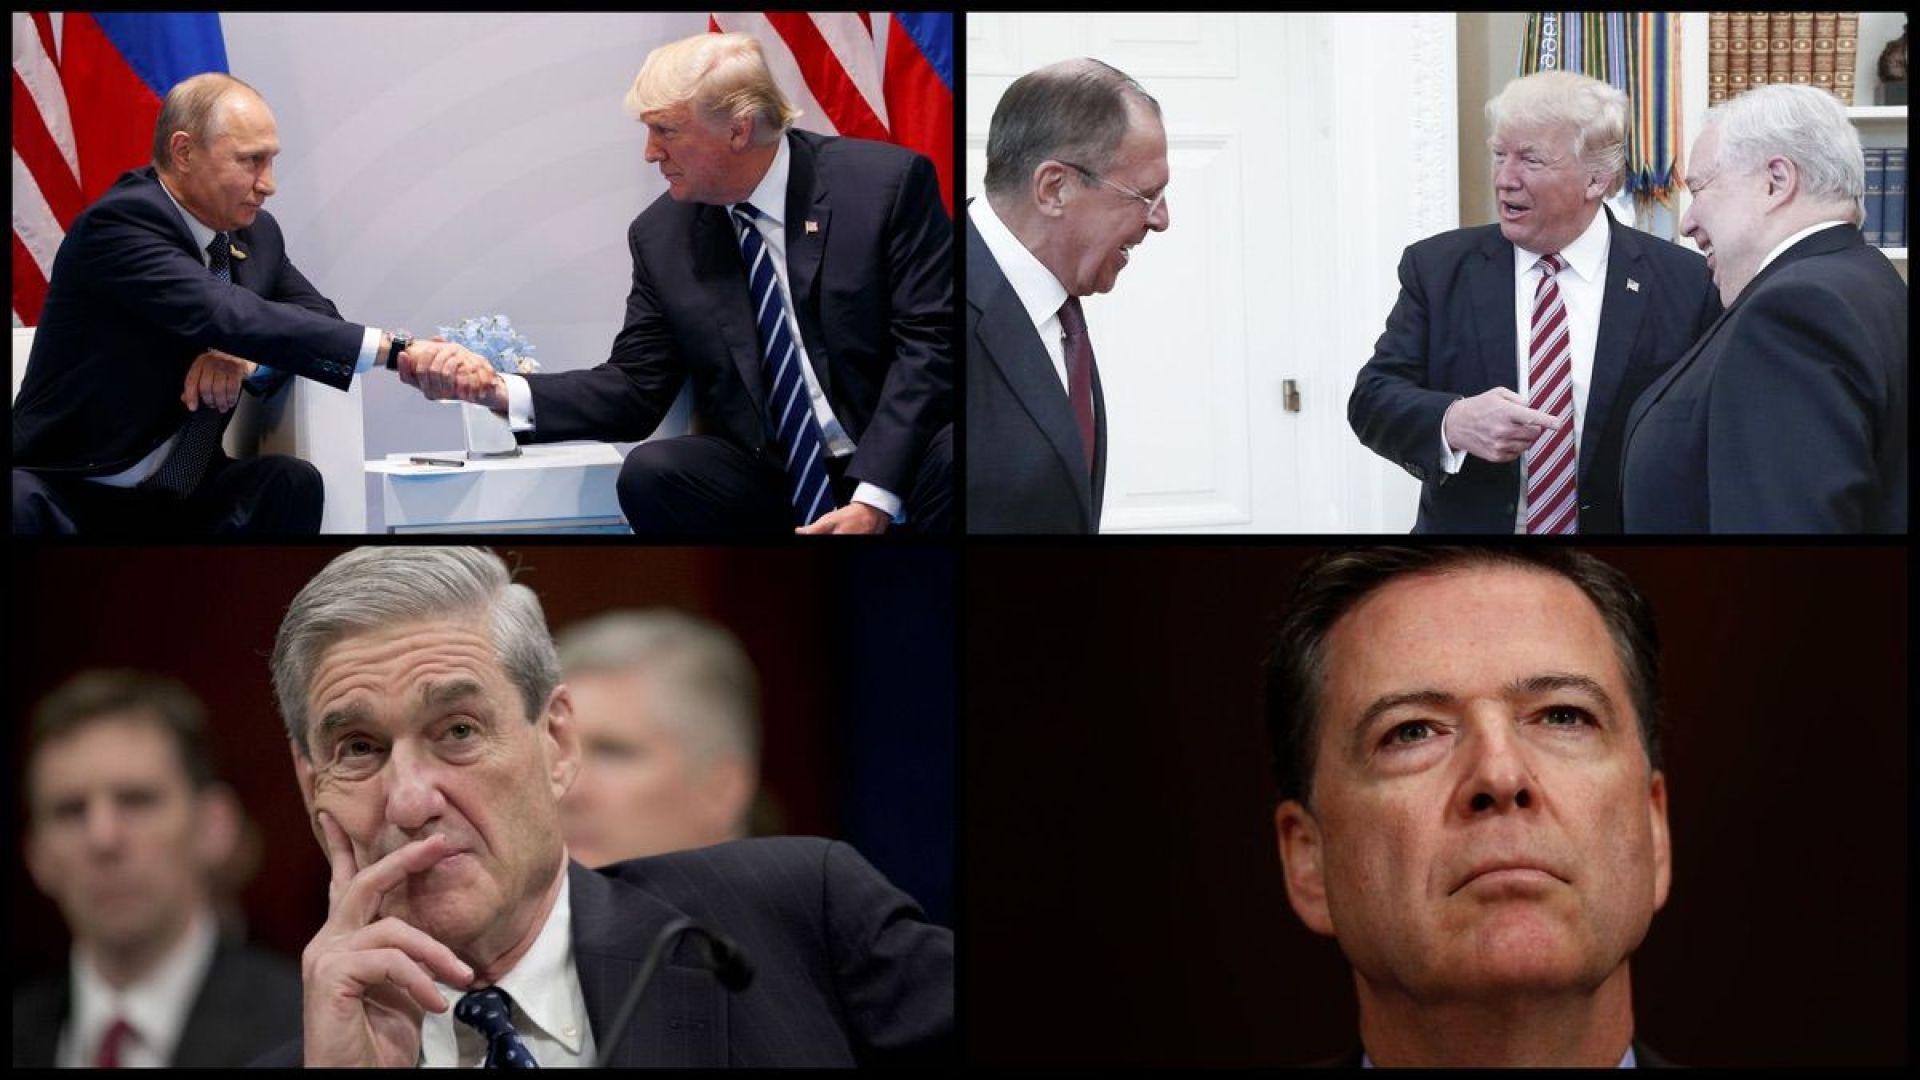 President Donald Trump, Russian President Vladimir Putin, Russian Foreign Minister Sergey Lavrov, Former Russian Ambassador Sergey Kislyak, Special Counsel Robert Mueller, and FBI Director James Comey (AP)